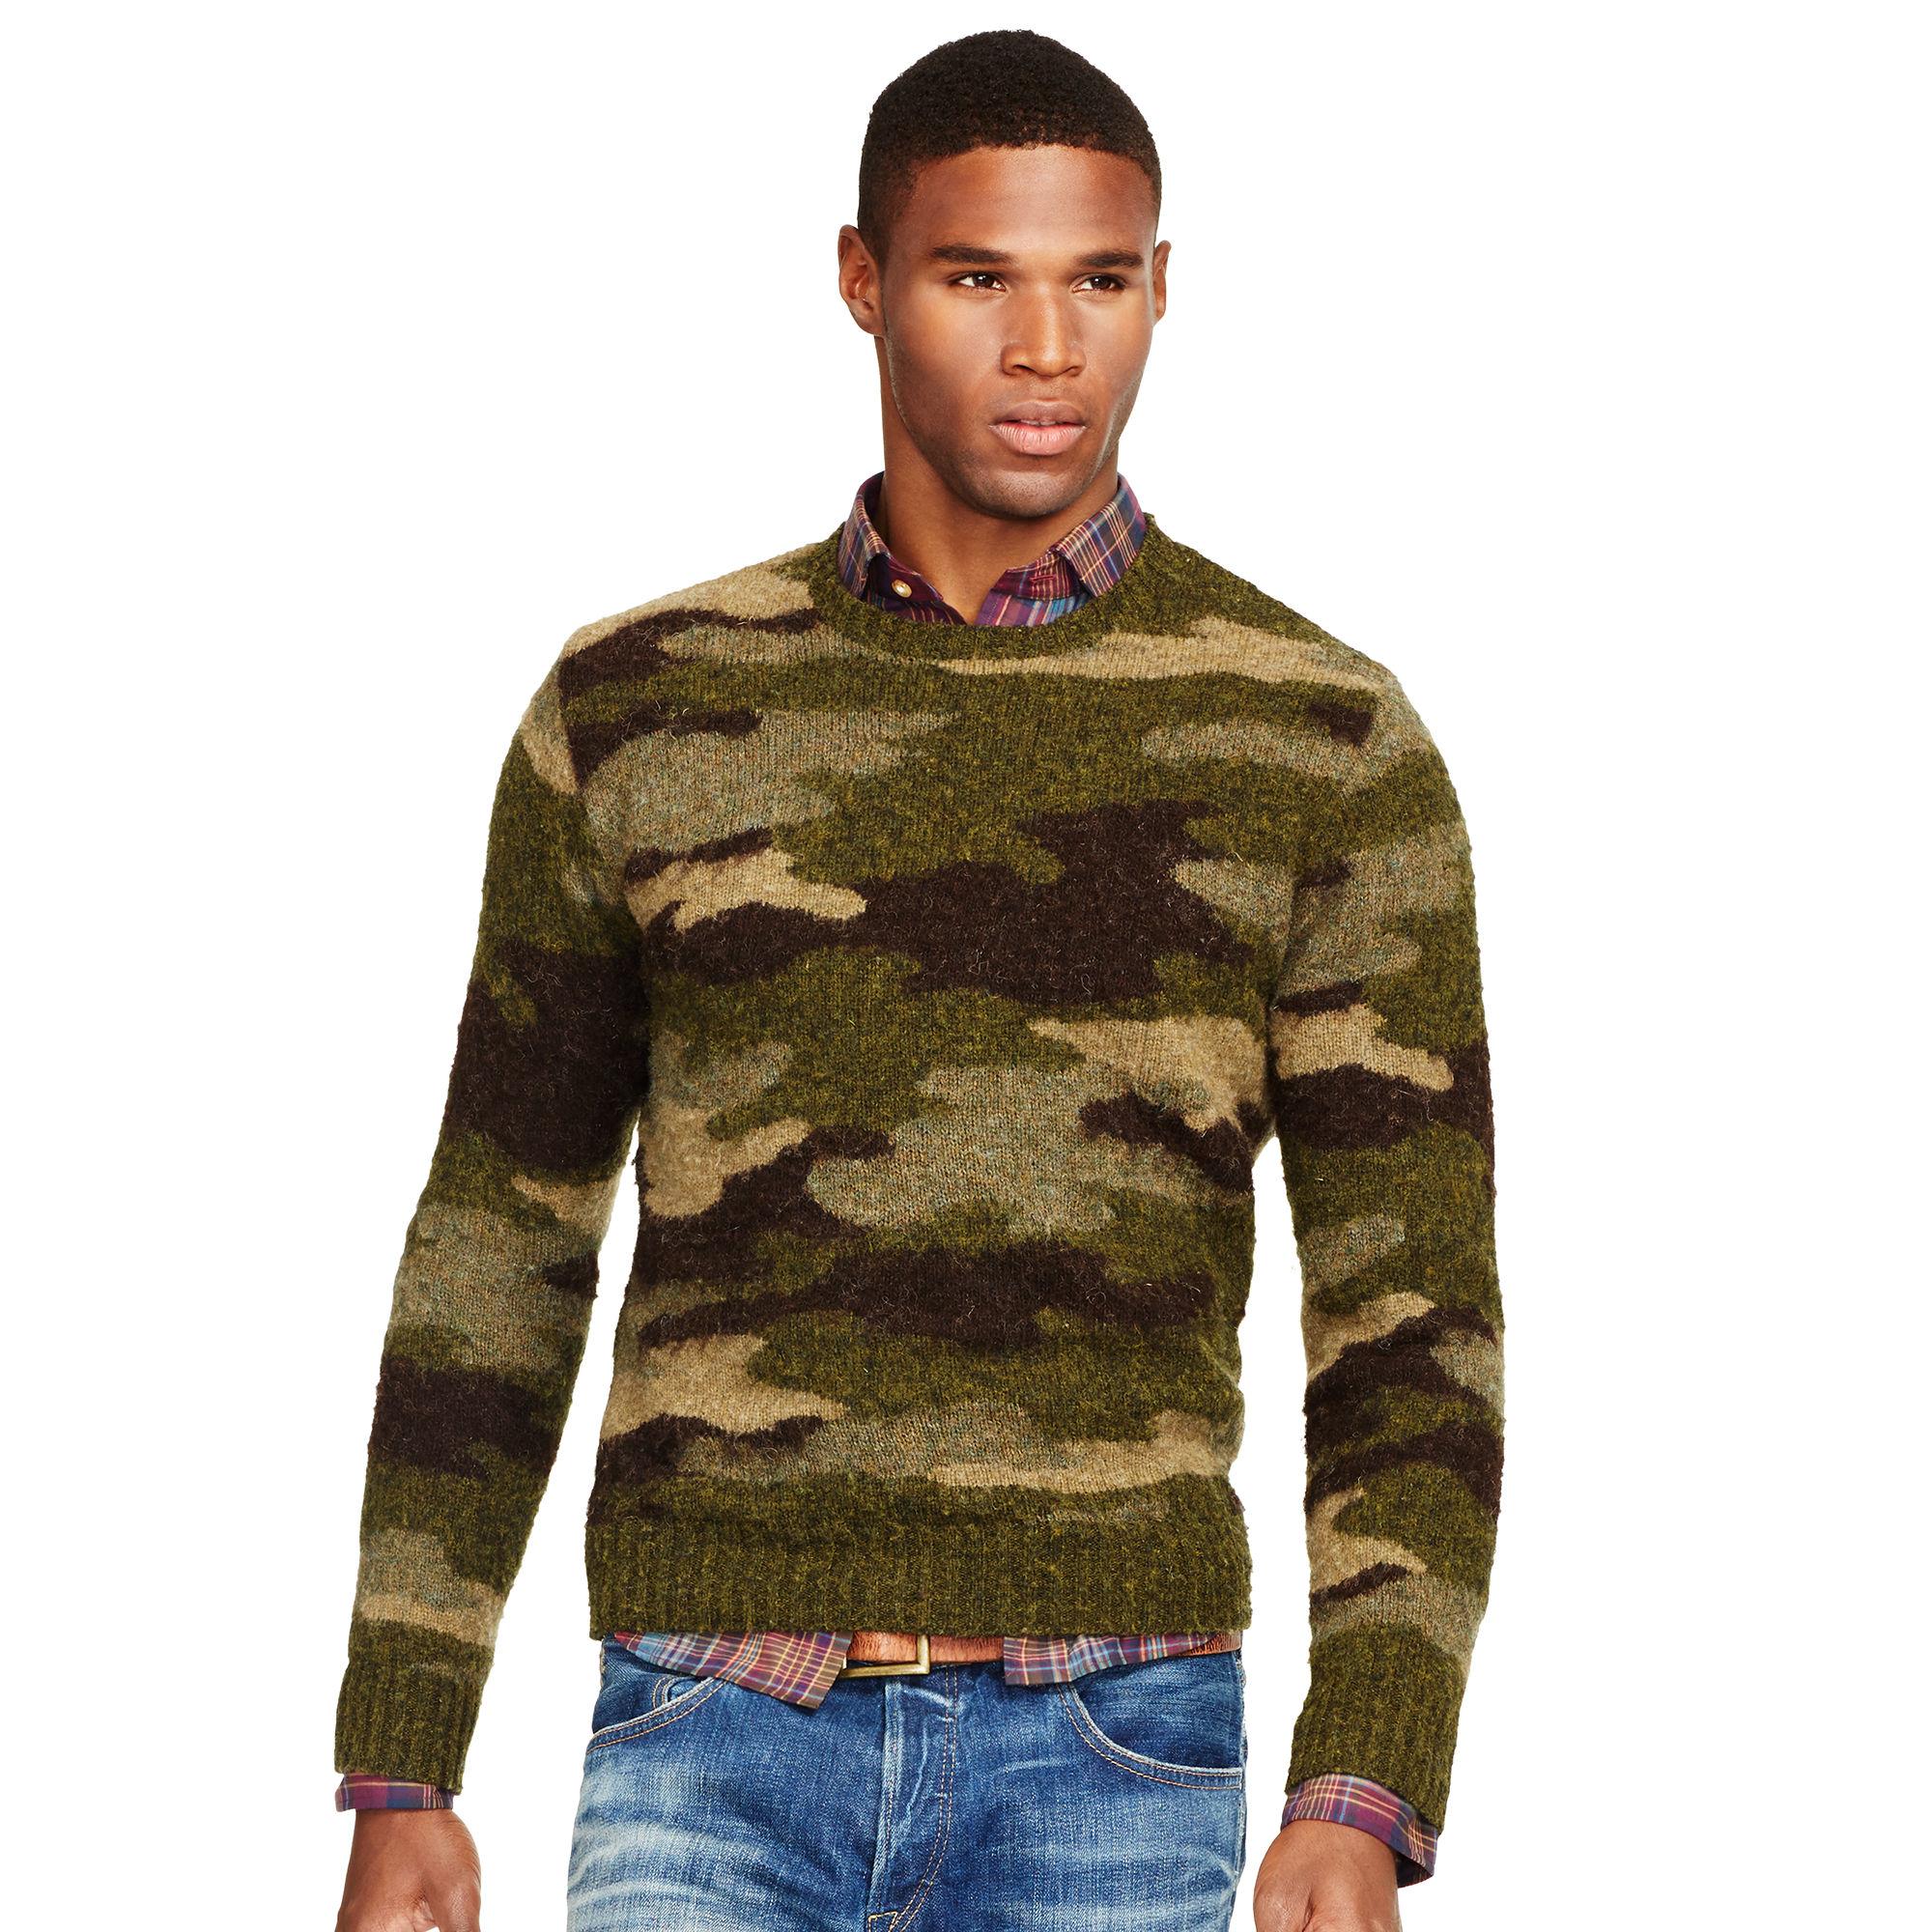 Polo Ralph Lauren Camo Wool Crewneck Sweater In Multicolor